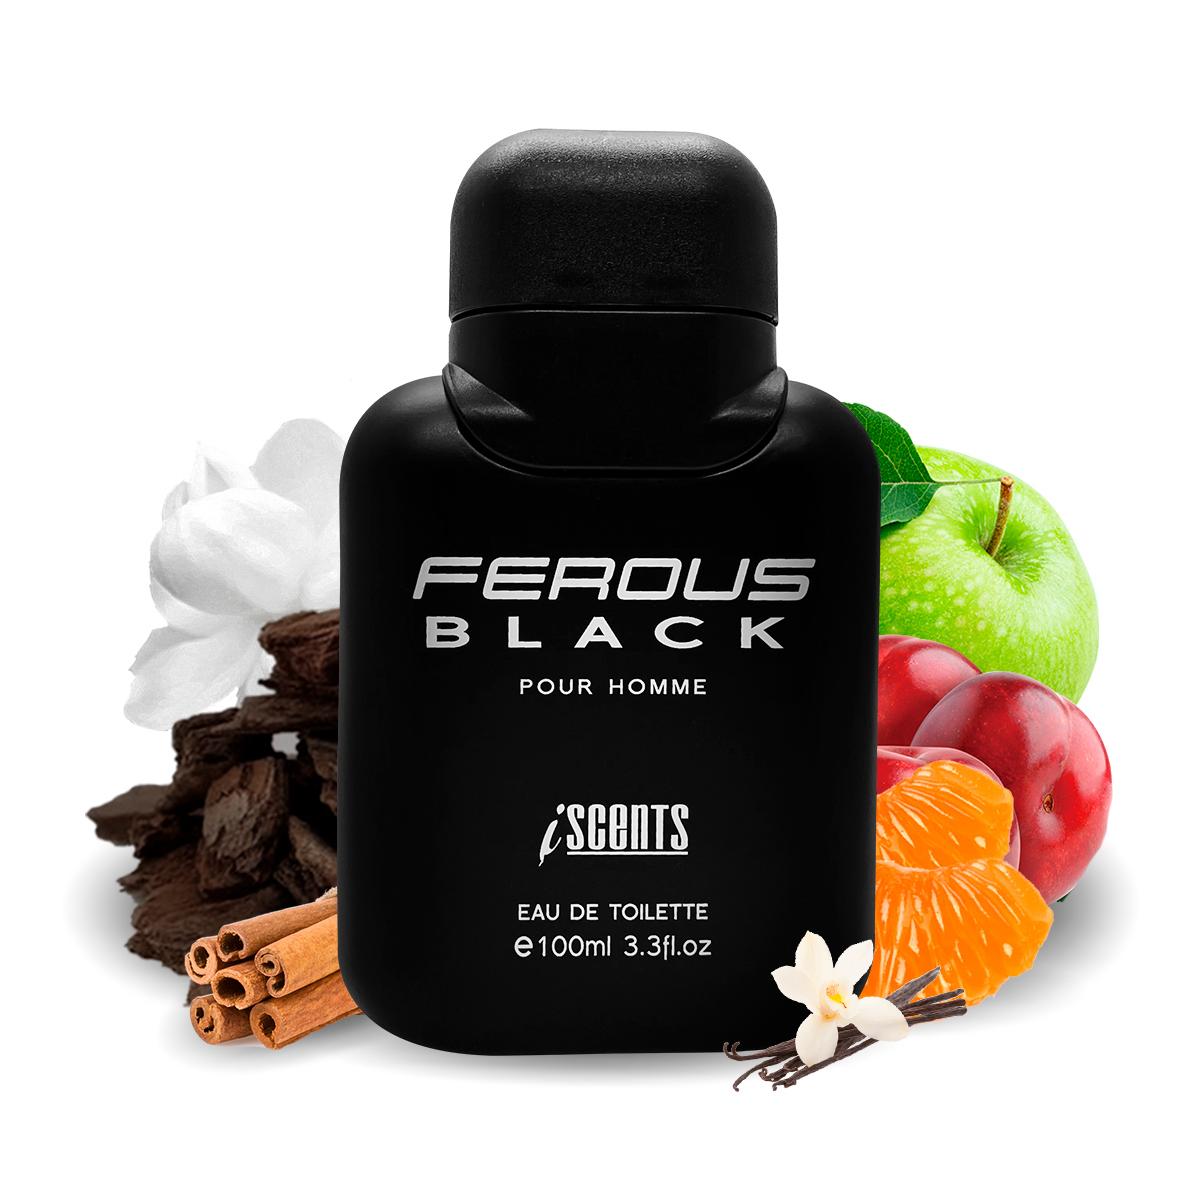 Kit 2 Perfumes Importados Ferous Black e Dublin I Scents